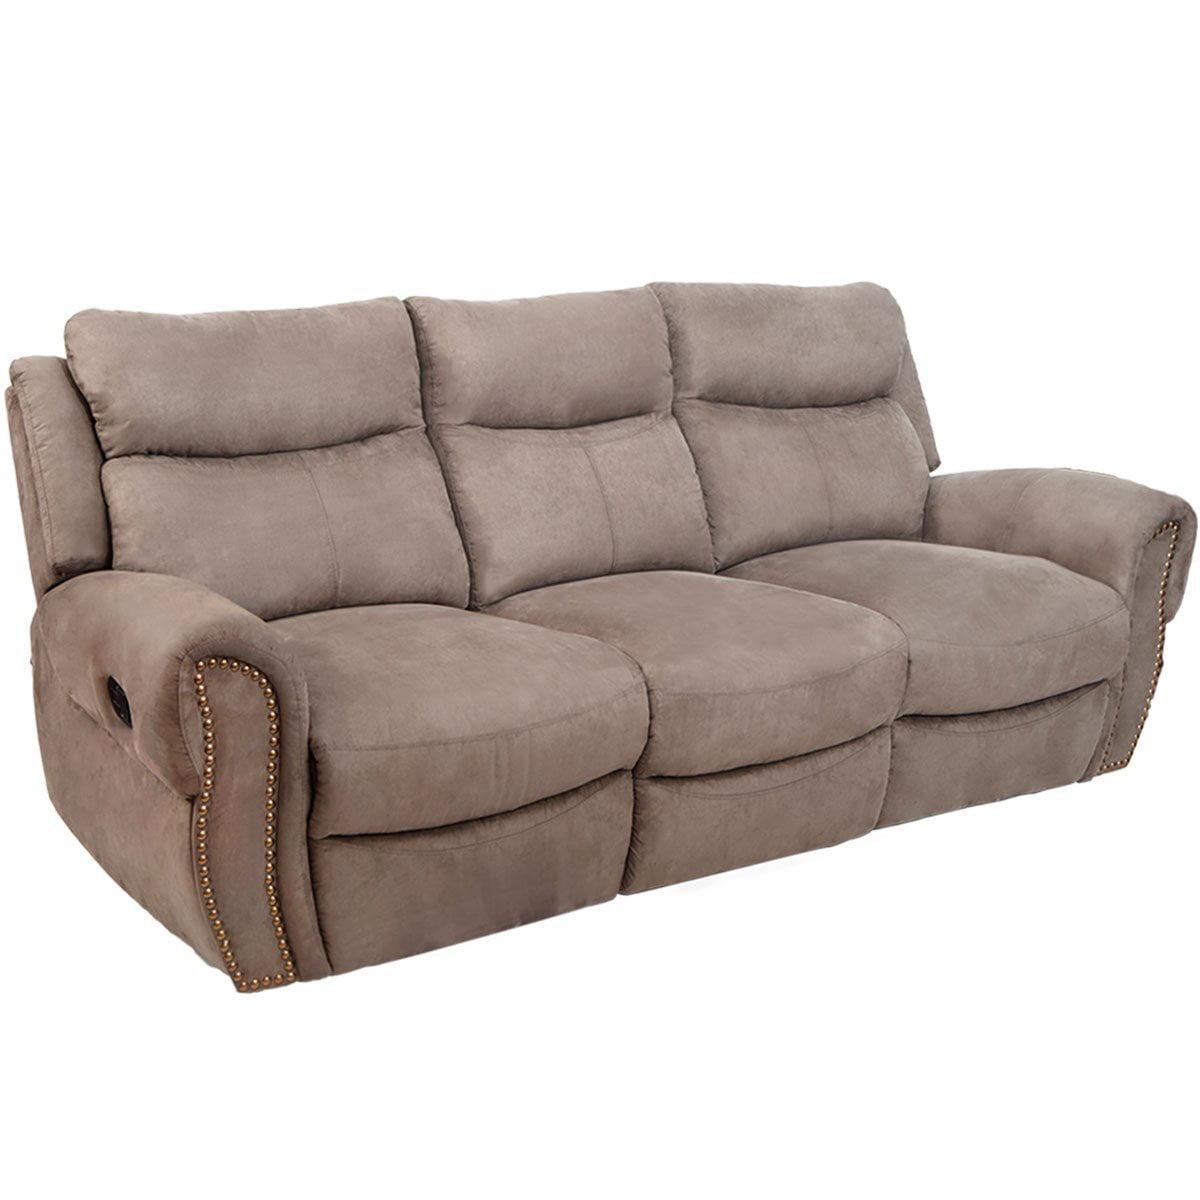 harper bright designs sectional sofa 3 seat sofa recliner